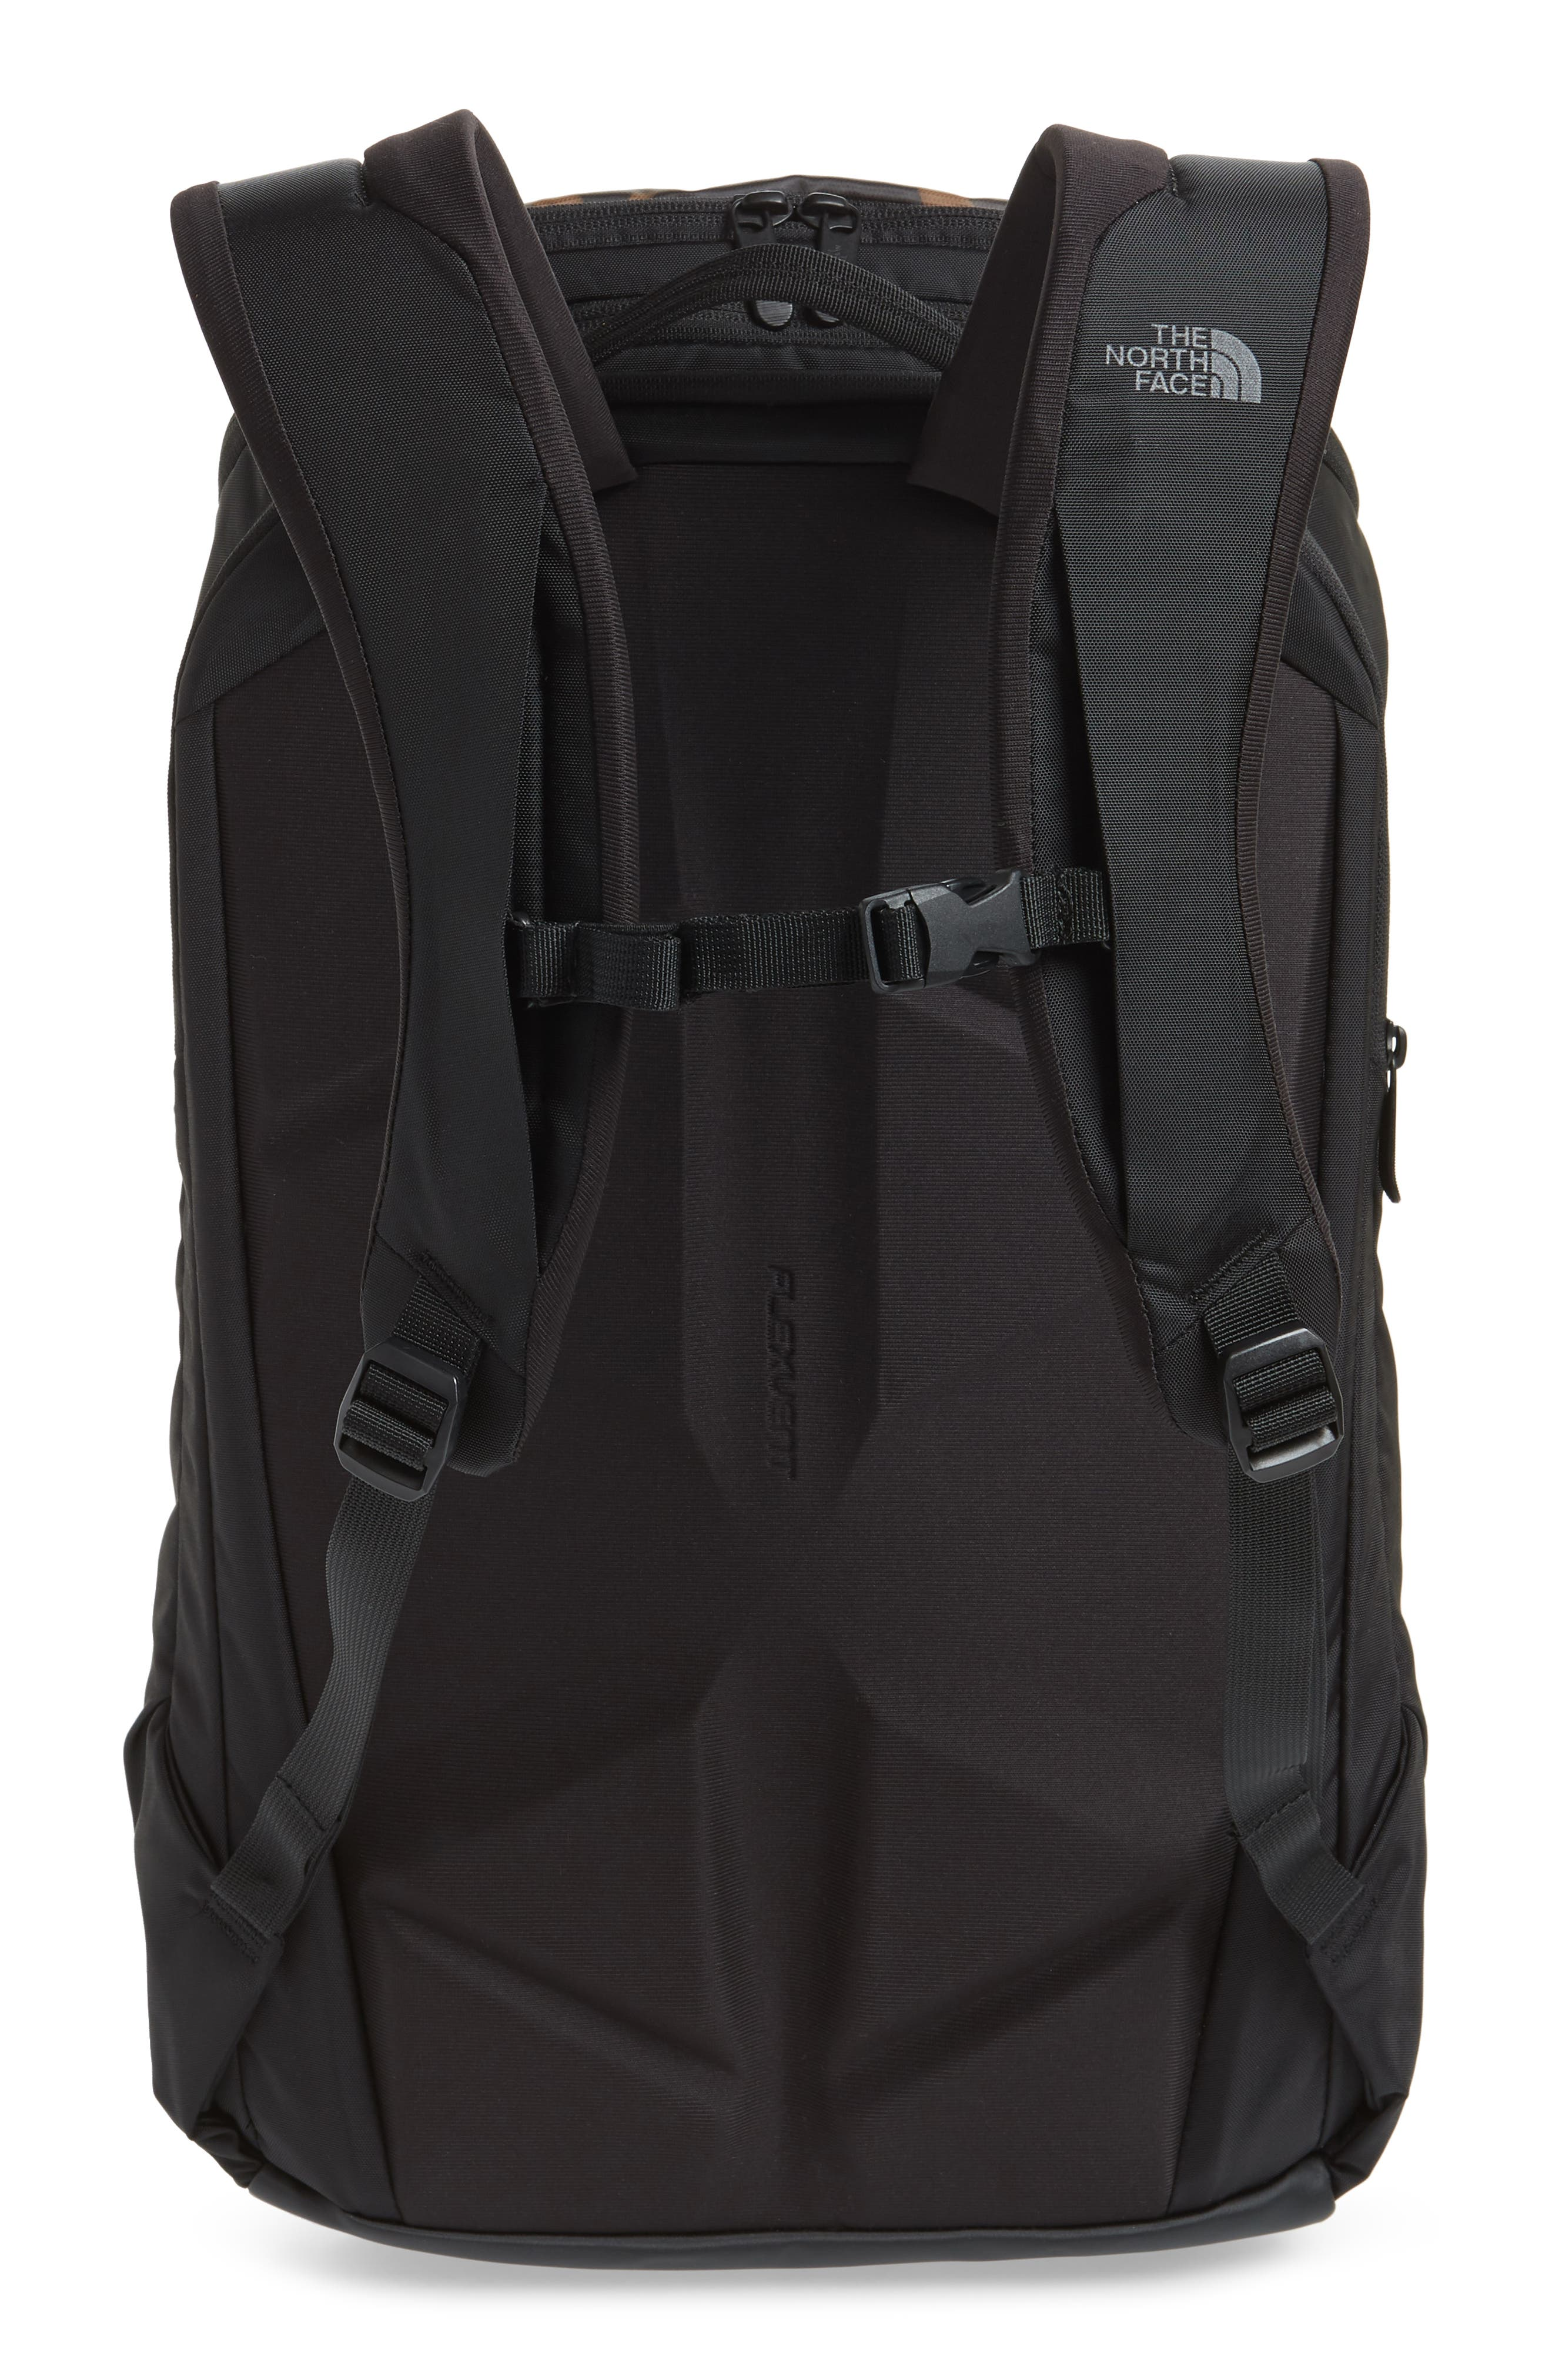 Ka-Ban Backpack,                             Alternate thumbnail 3, color,                             TAUPE GREEN/ MACROFLECK PRINT